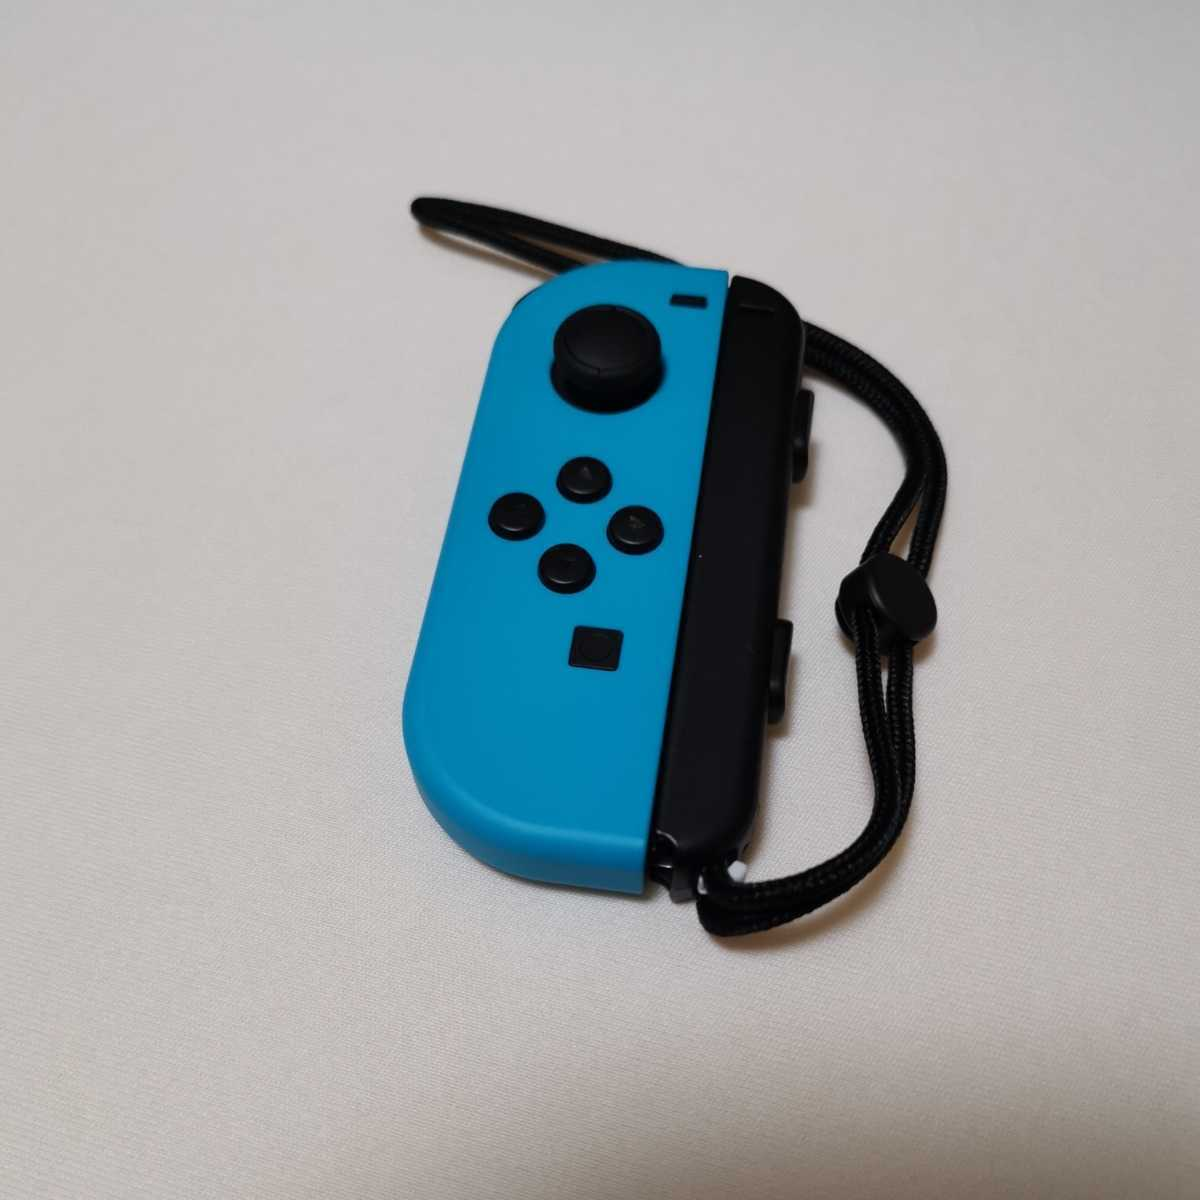 Nintendo Switch Joy-Con (L) ネオンブルー ニンテンドースイッチ ジョイコン 左 送料無料